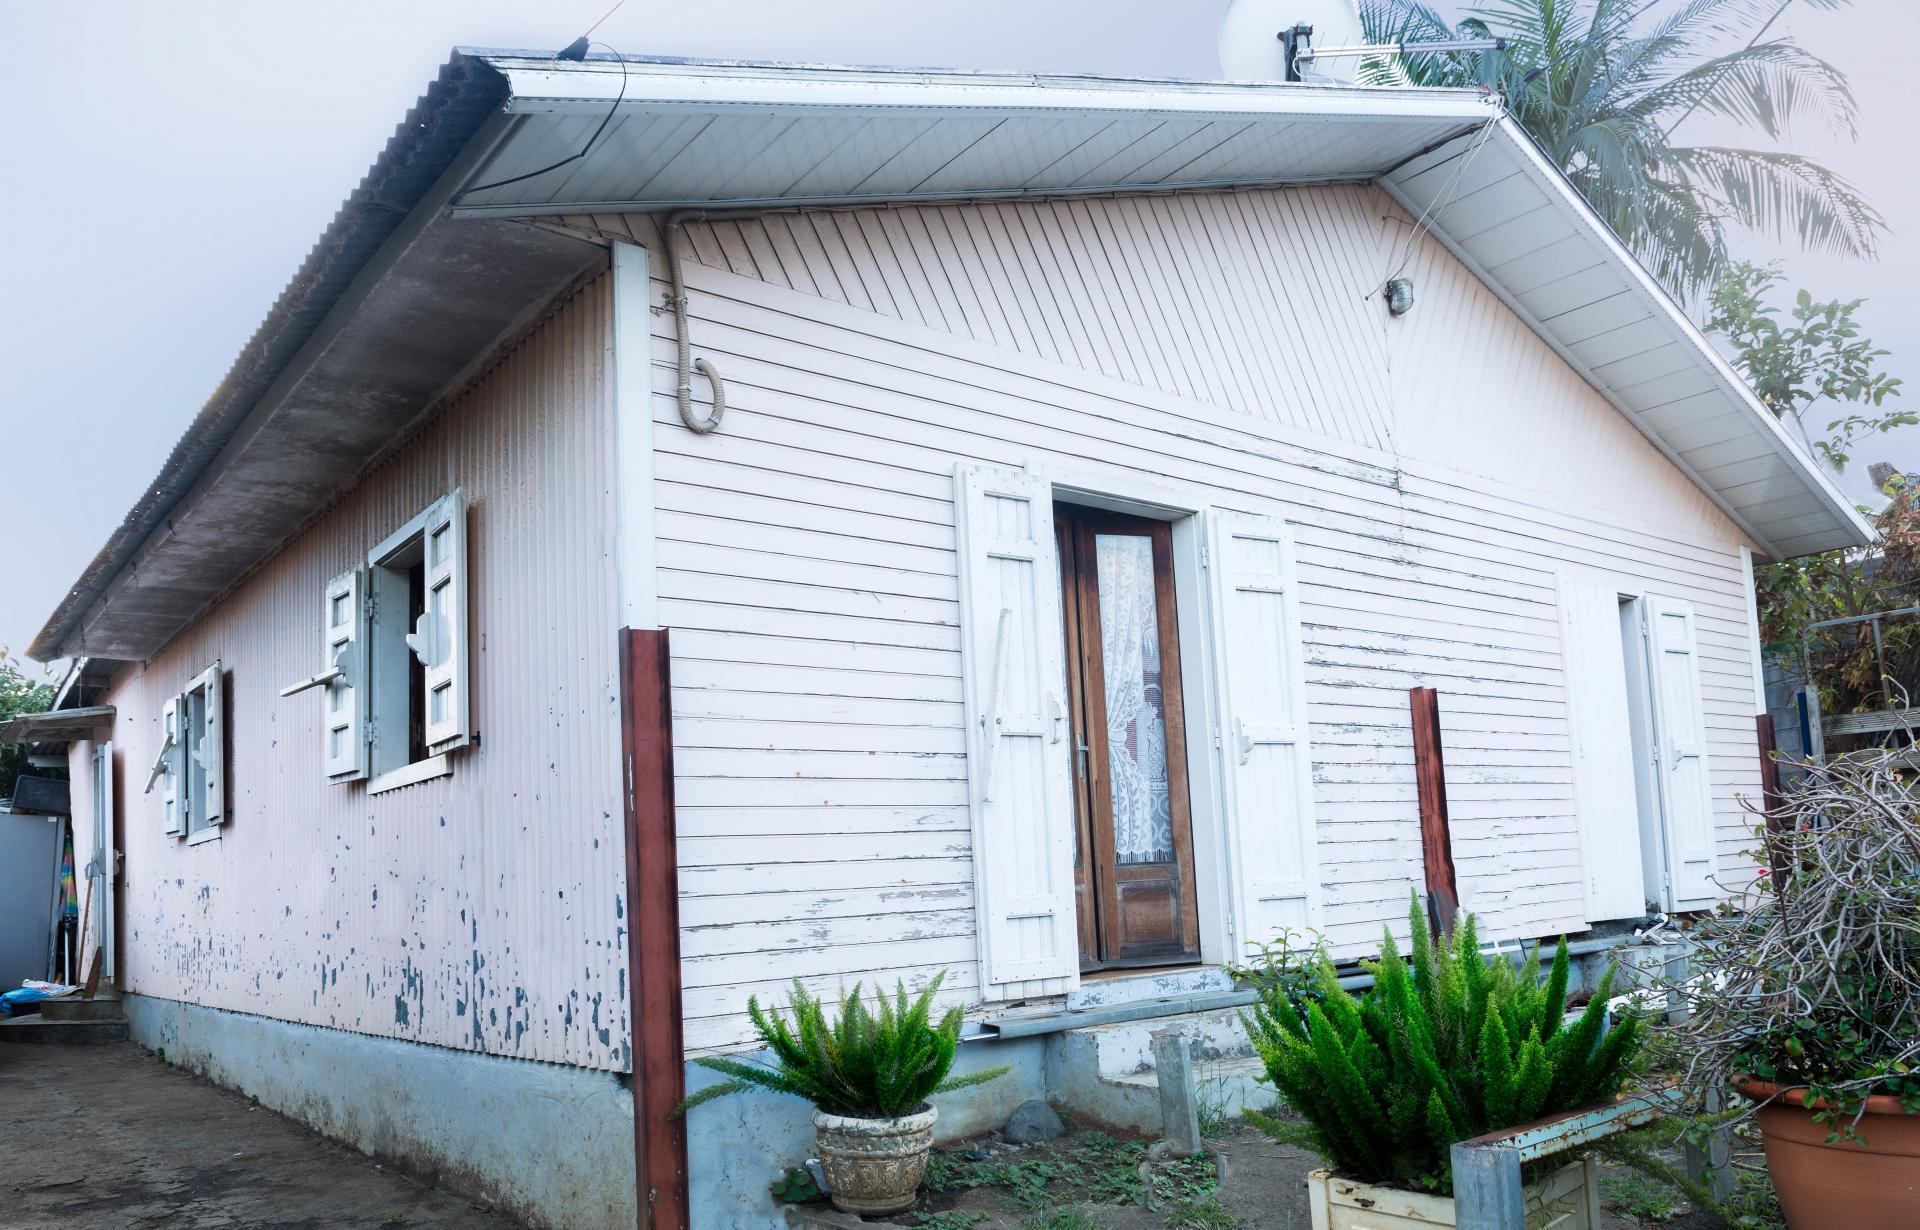 Terrain à bâtir ou maison à rénover